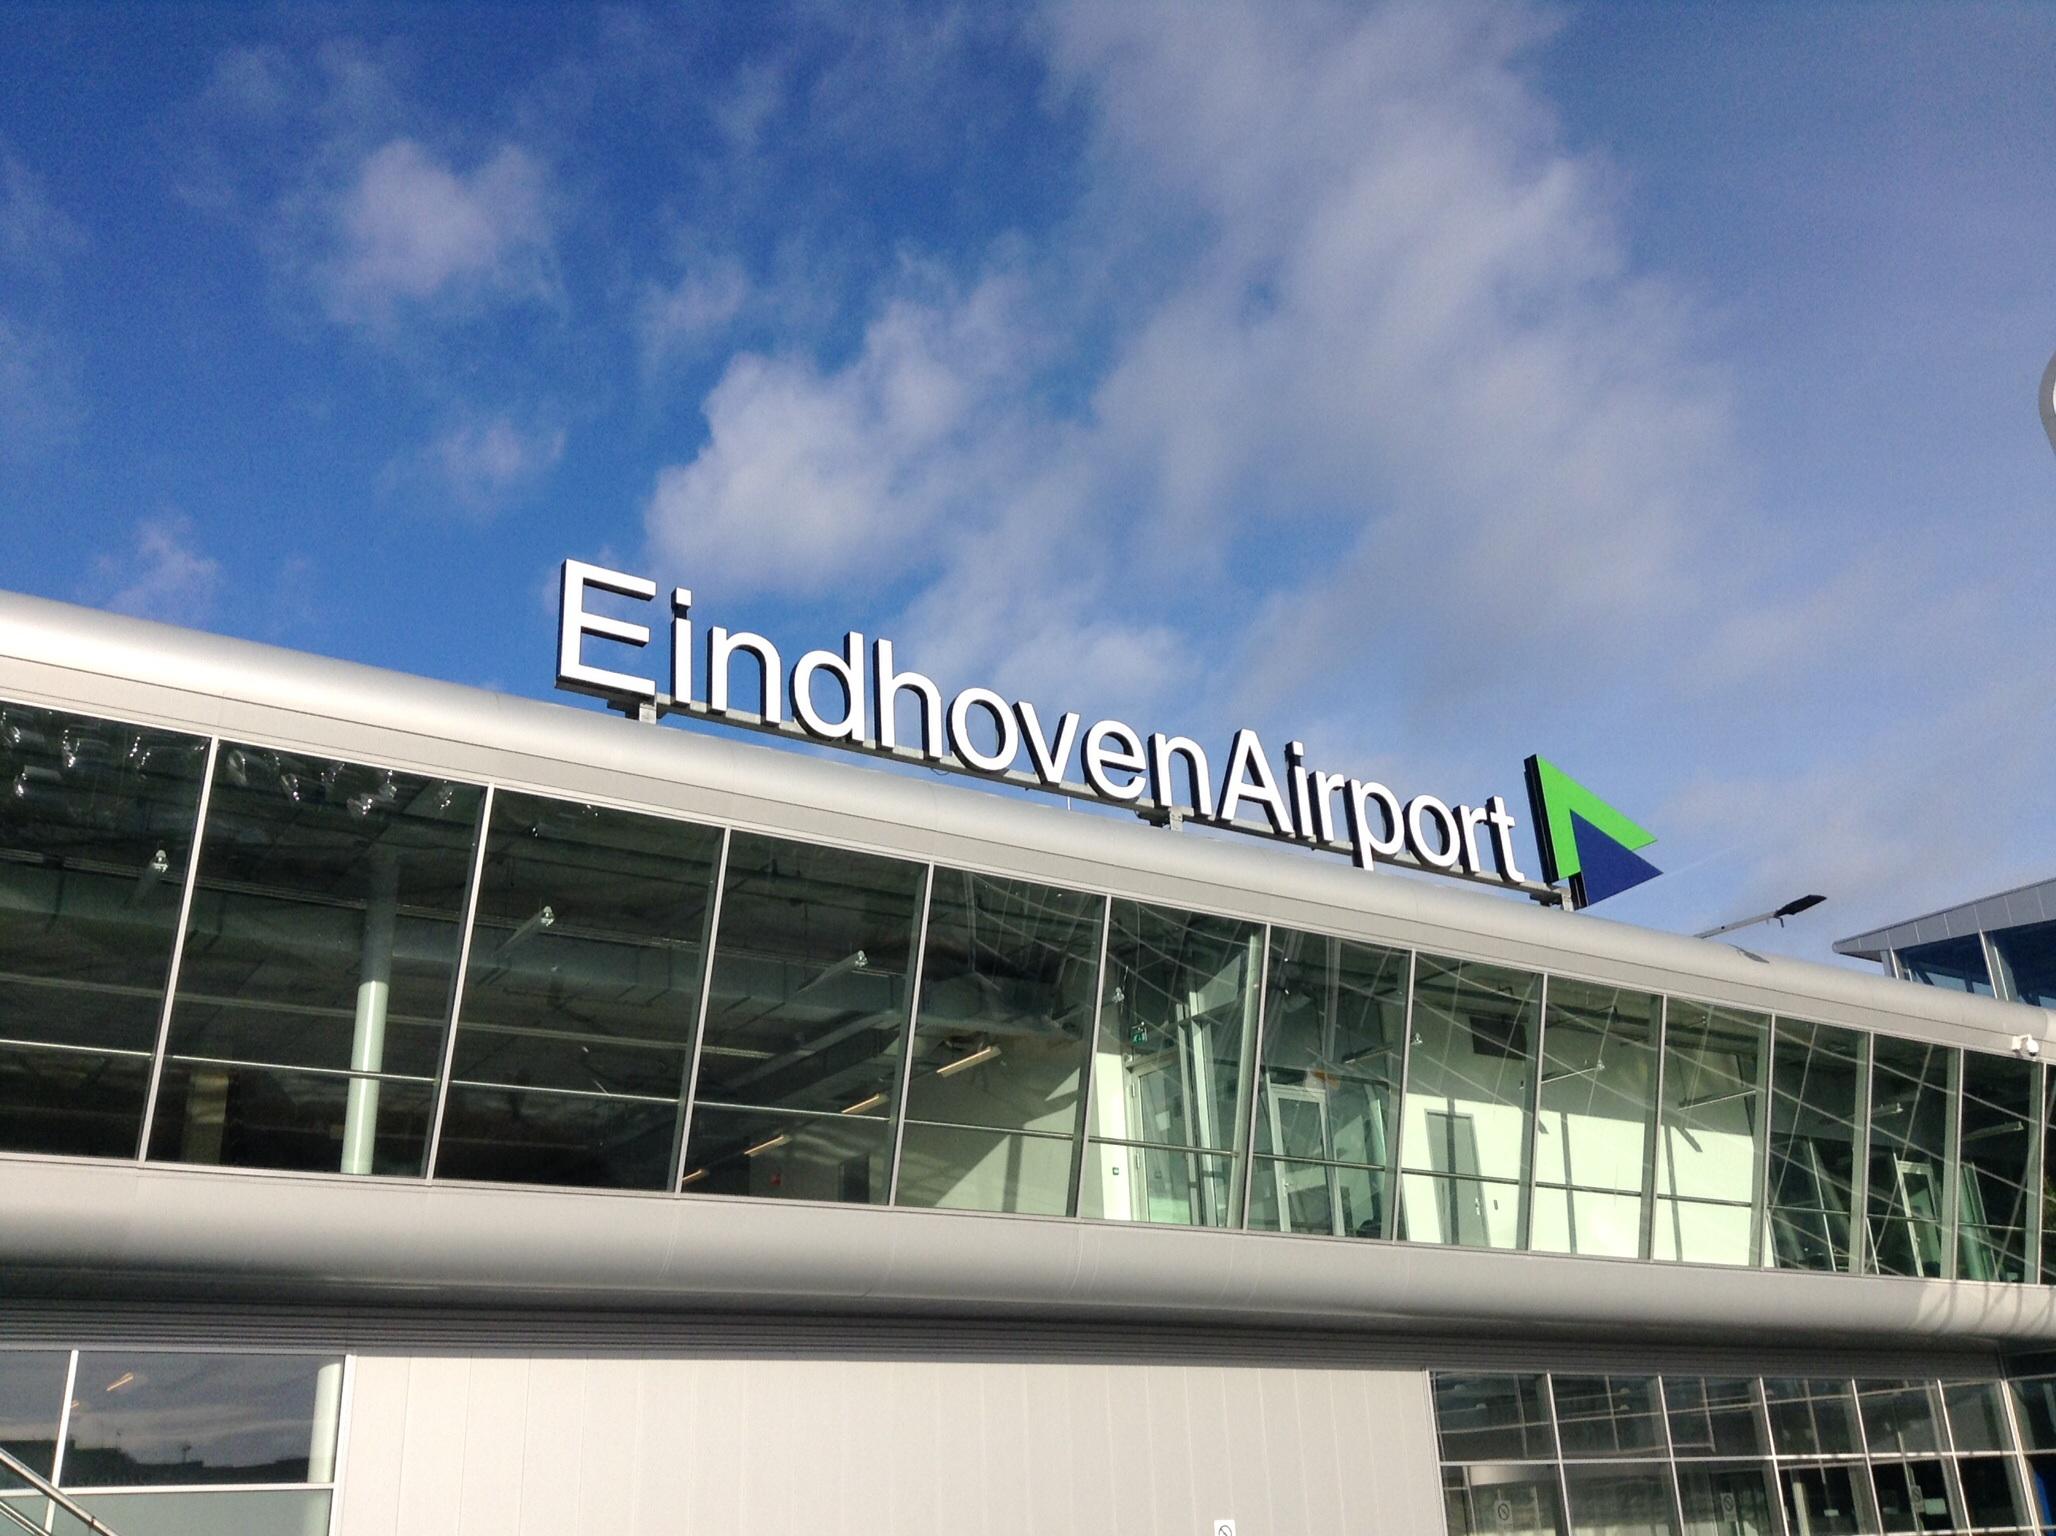 Red Dot Award vertrekgebied Eindhoven Airport